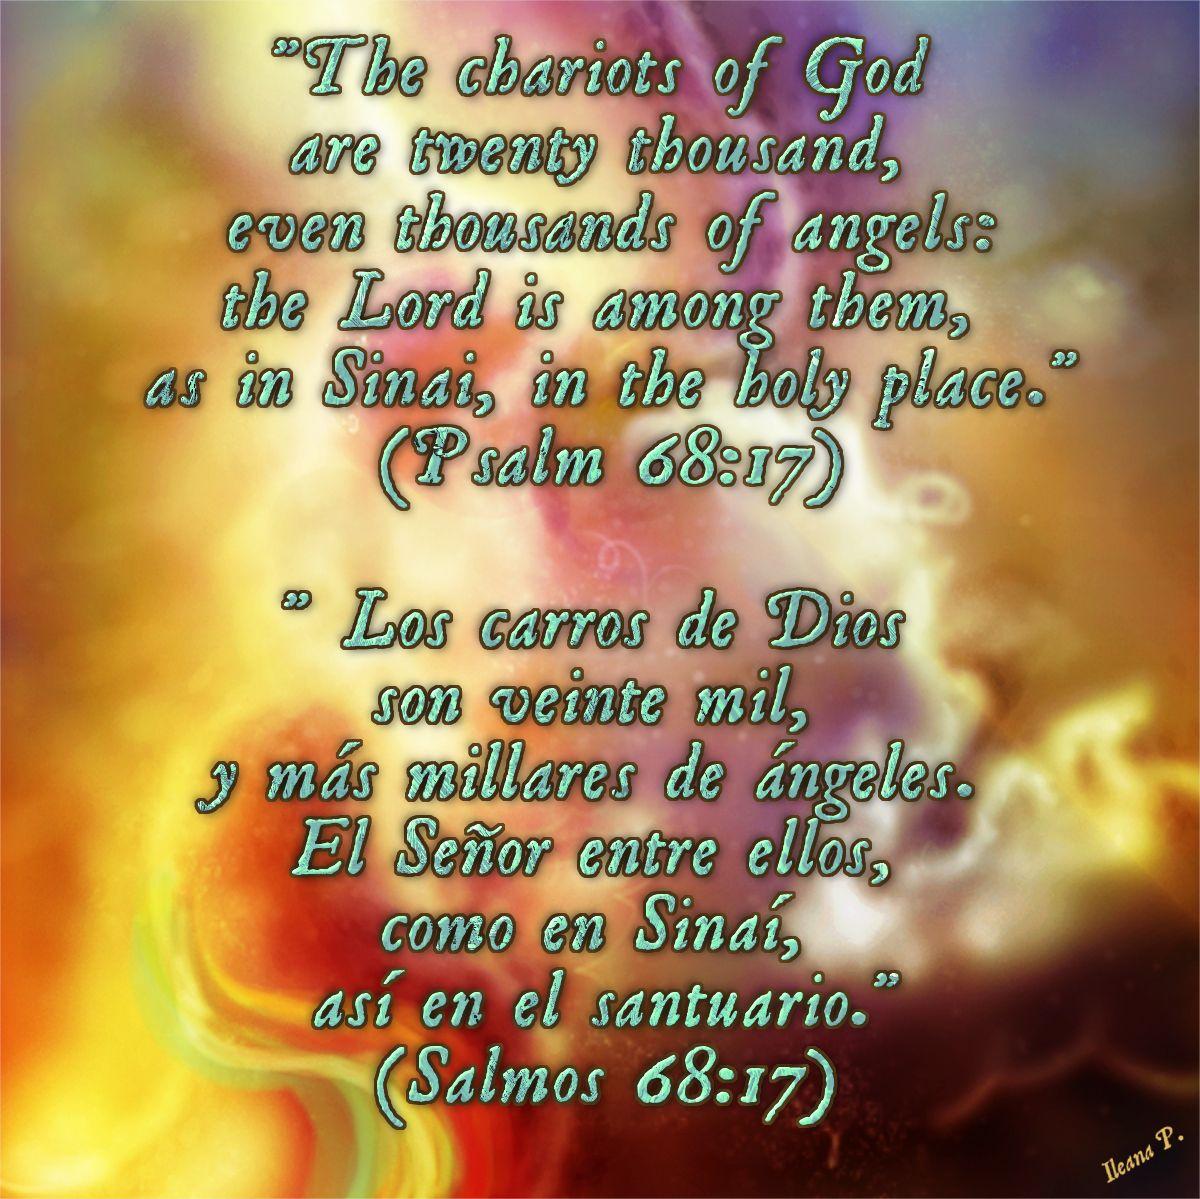 Psalm 68 17 Salmos 68 17 Psalm 68 Psalms Book Of Psalms